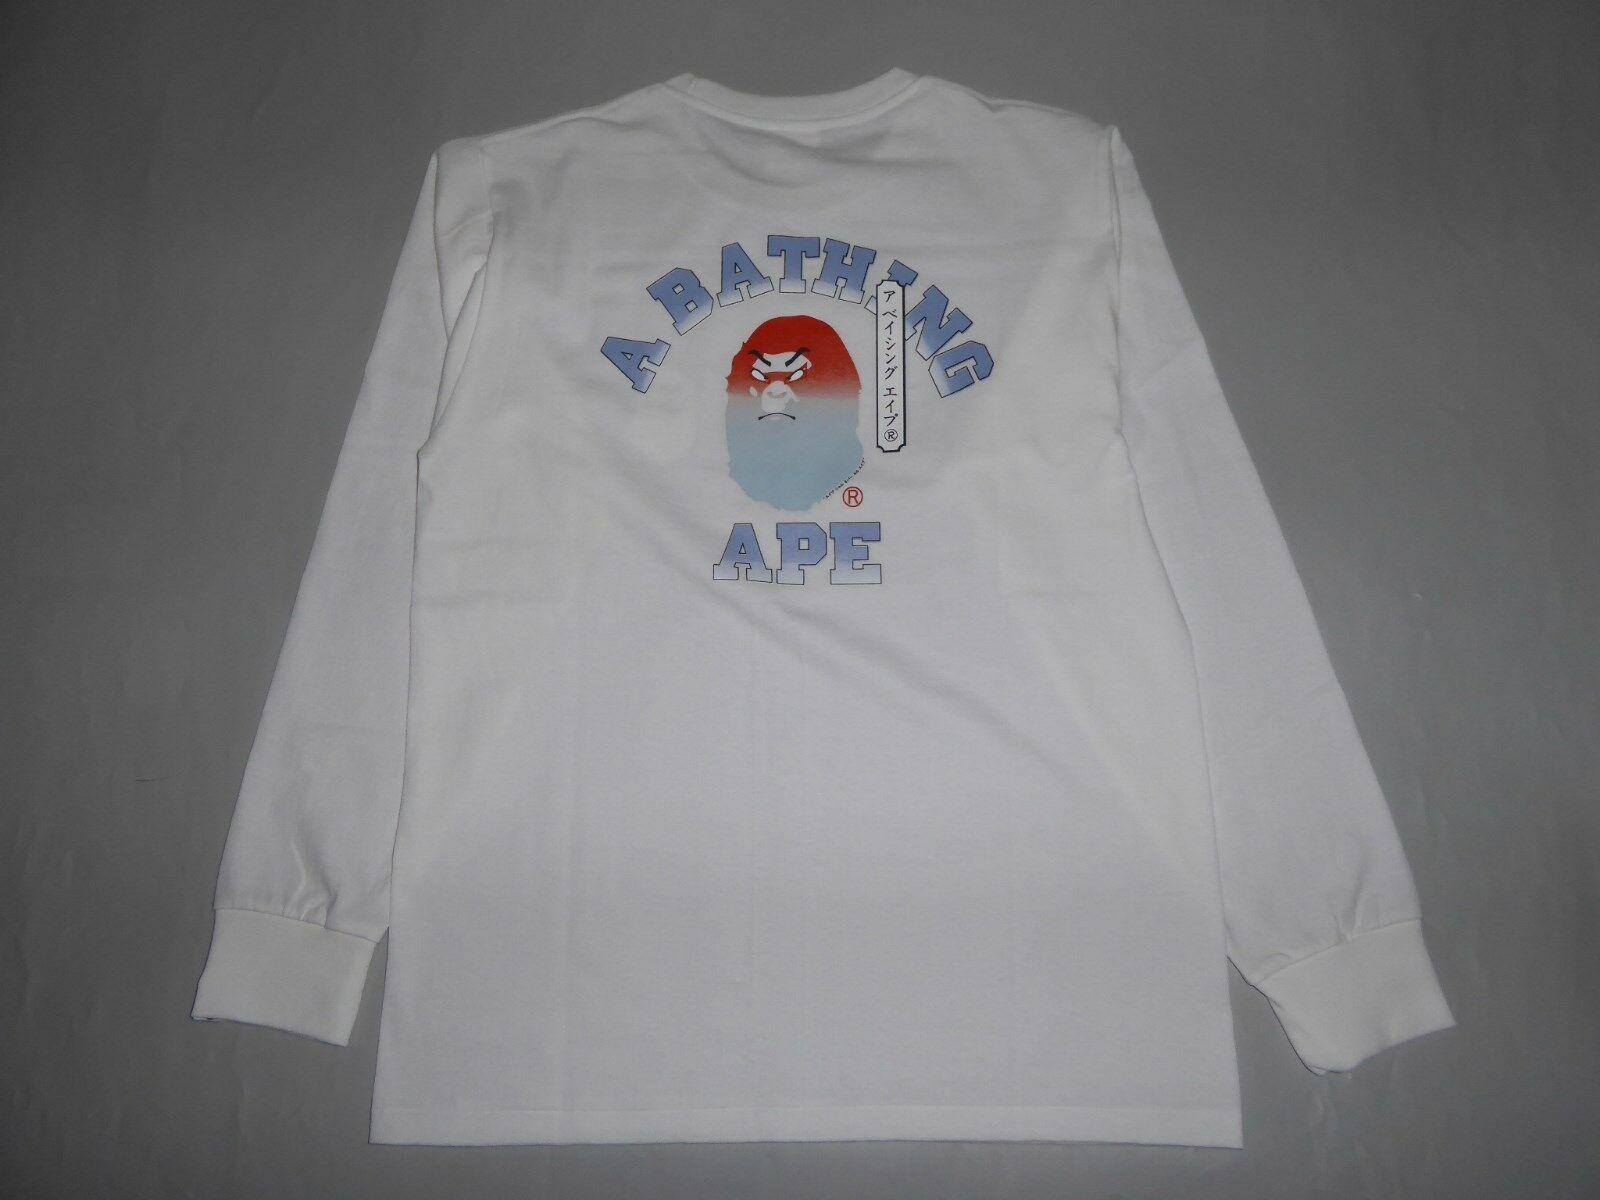 19371 bape kabuki college long sleeve white tee M